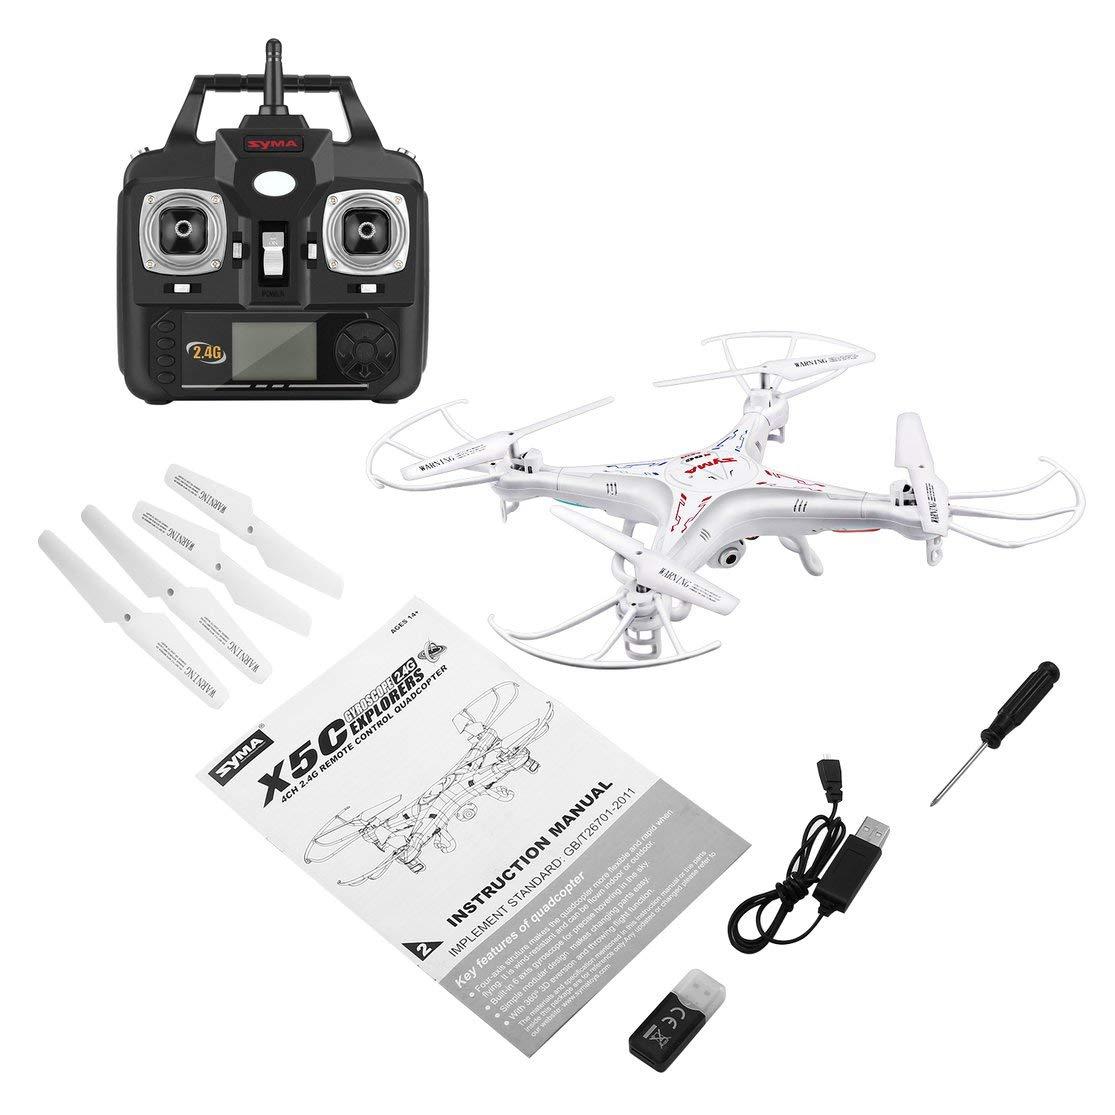 Kaemma Syma X5C 2.4G 6 Ejes Gyro RC Aviones Quadcopter Drone UAV ...